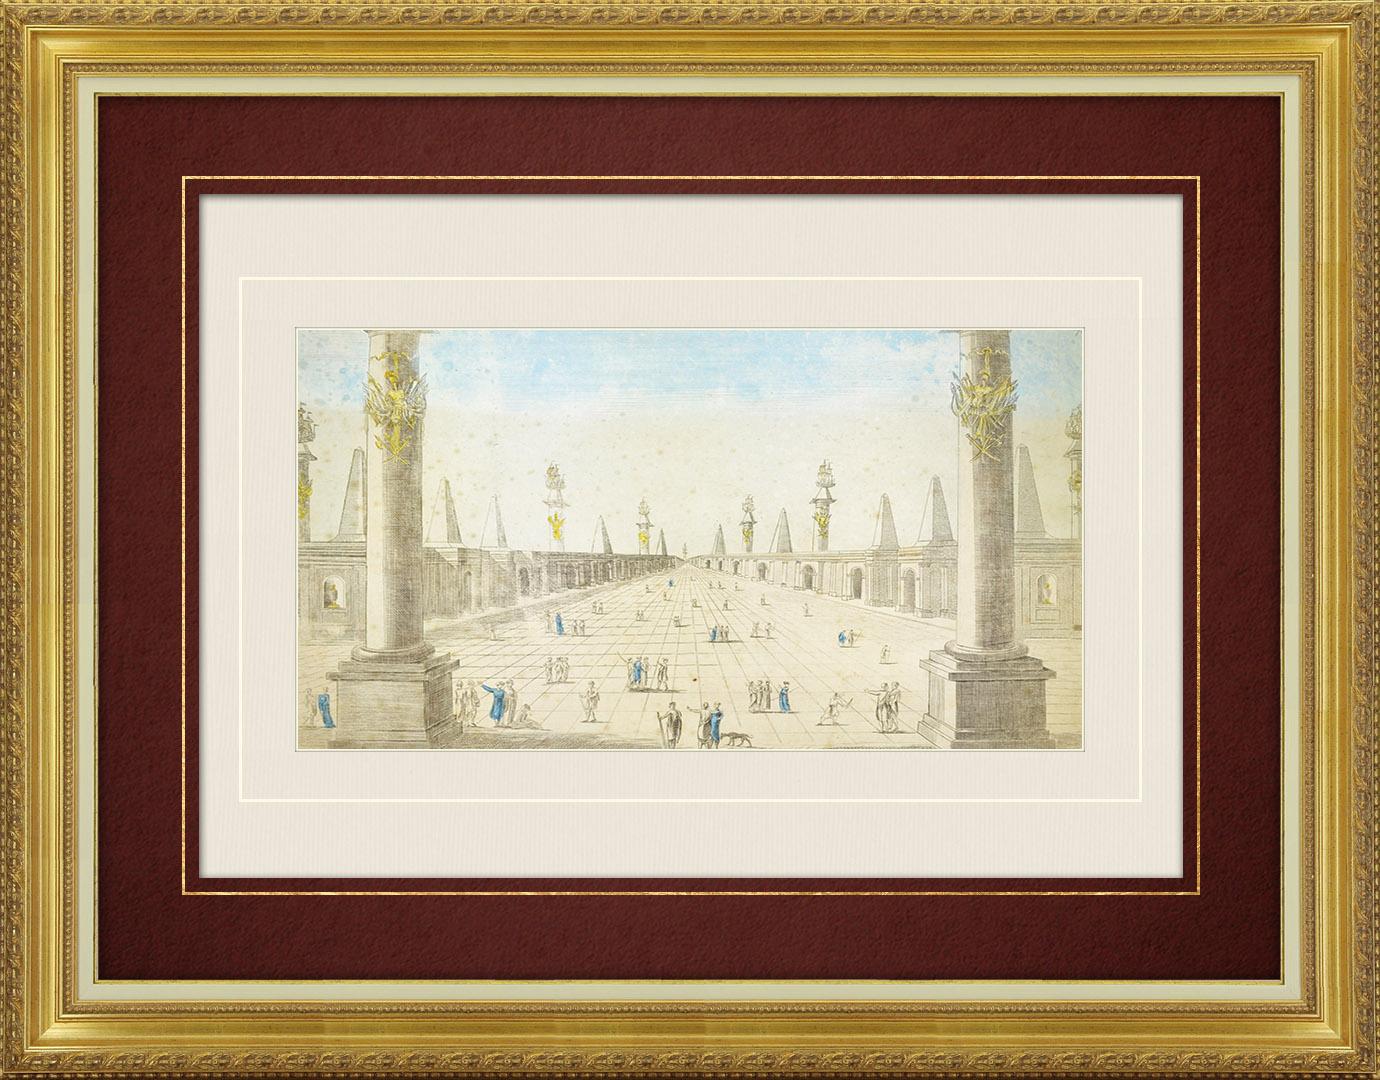 18th Century optical view in original watercolors of the Mosque of the Prophet in Medina (Saudi Arabia)